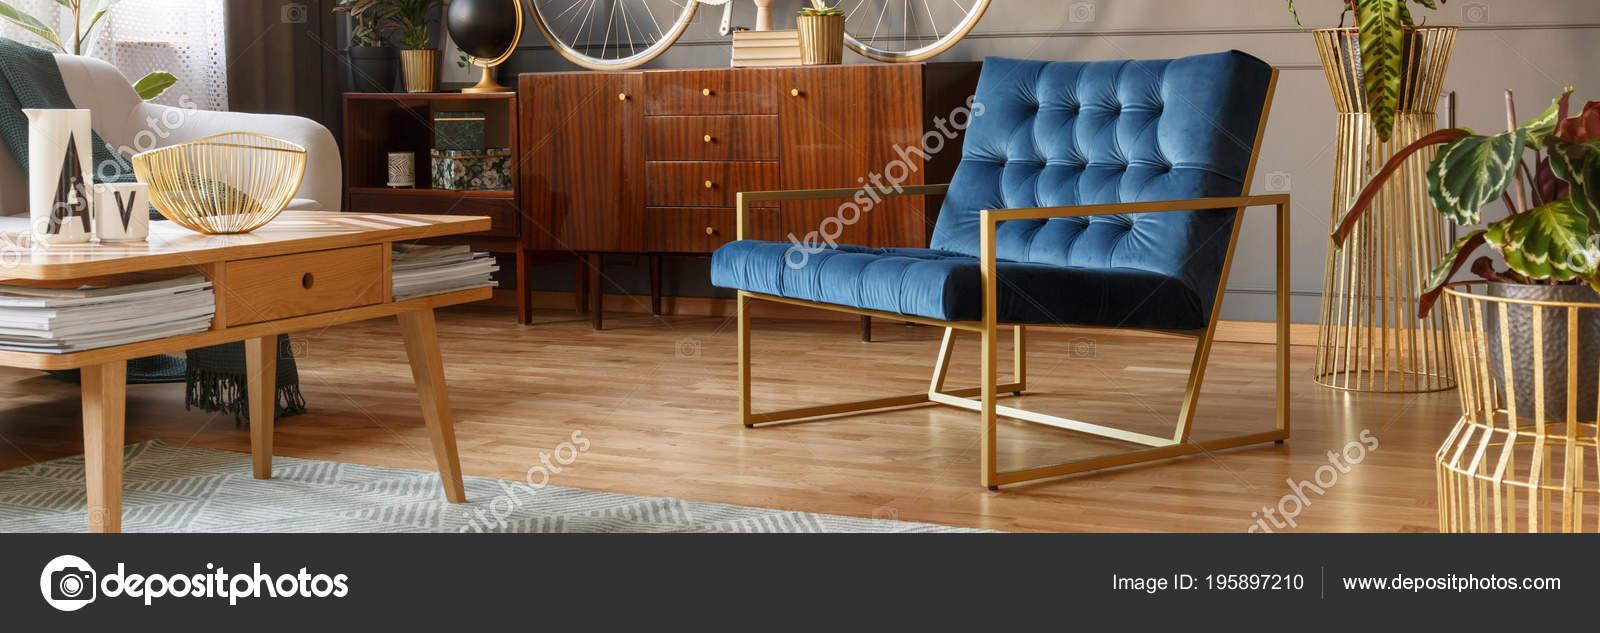 Royal Blue Armchair Gold Frame Standing Vintage Living Room